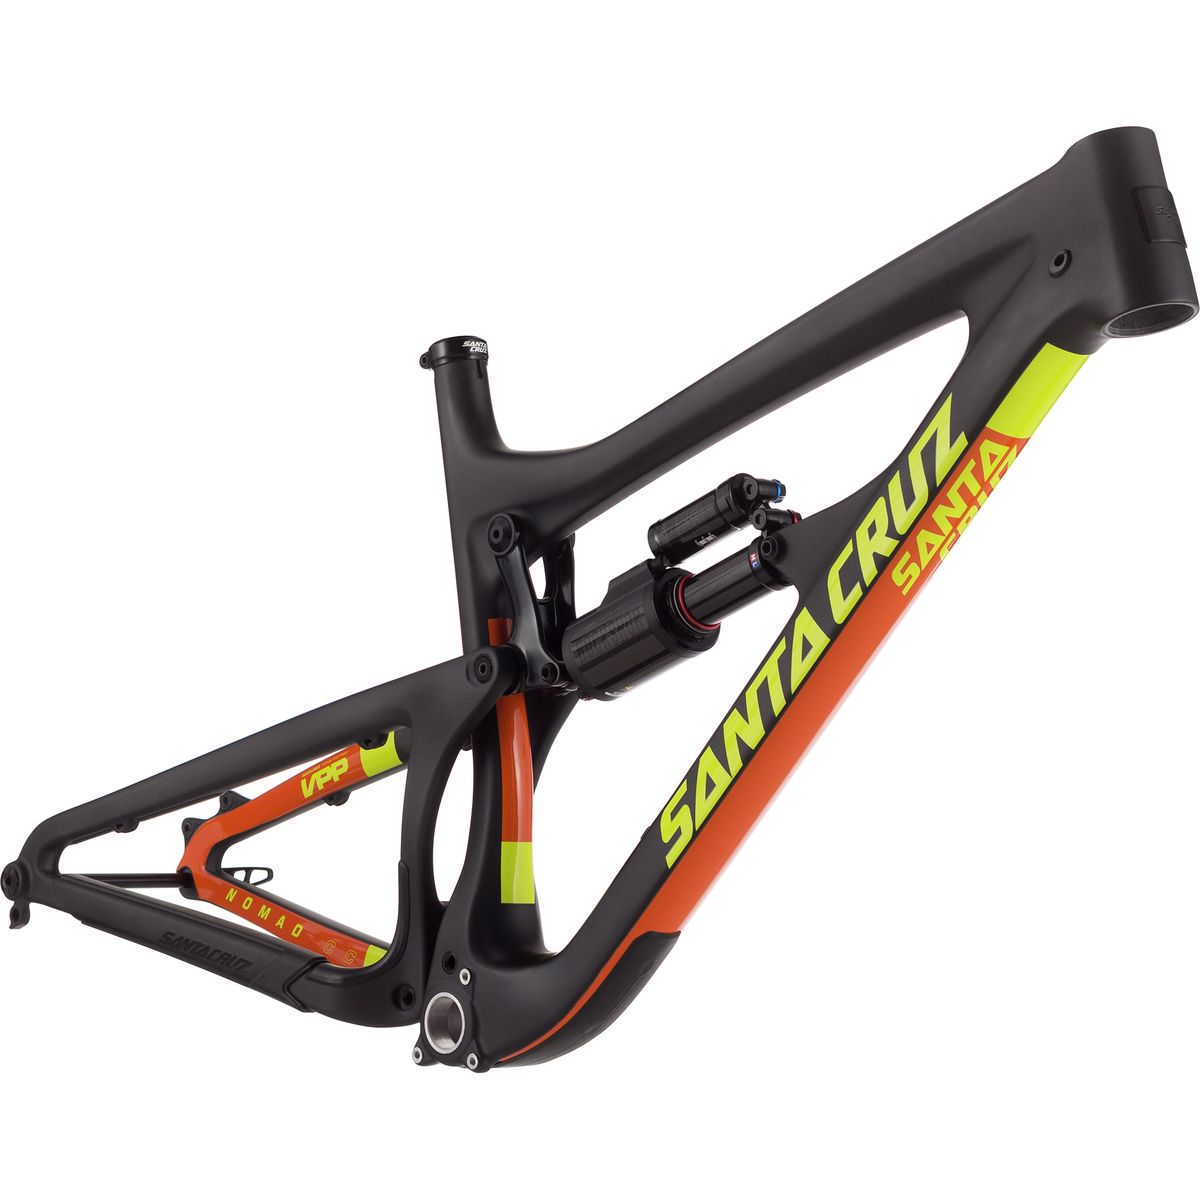 Santa Cruz Bicycles Nomad Carbon Cc Monarch Plus Mountain Bike Frame Mosso 669 Xc Pro Tech Specs Material